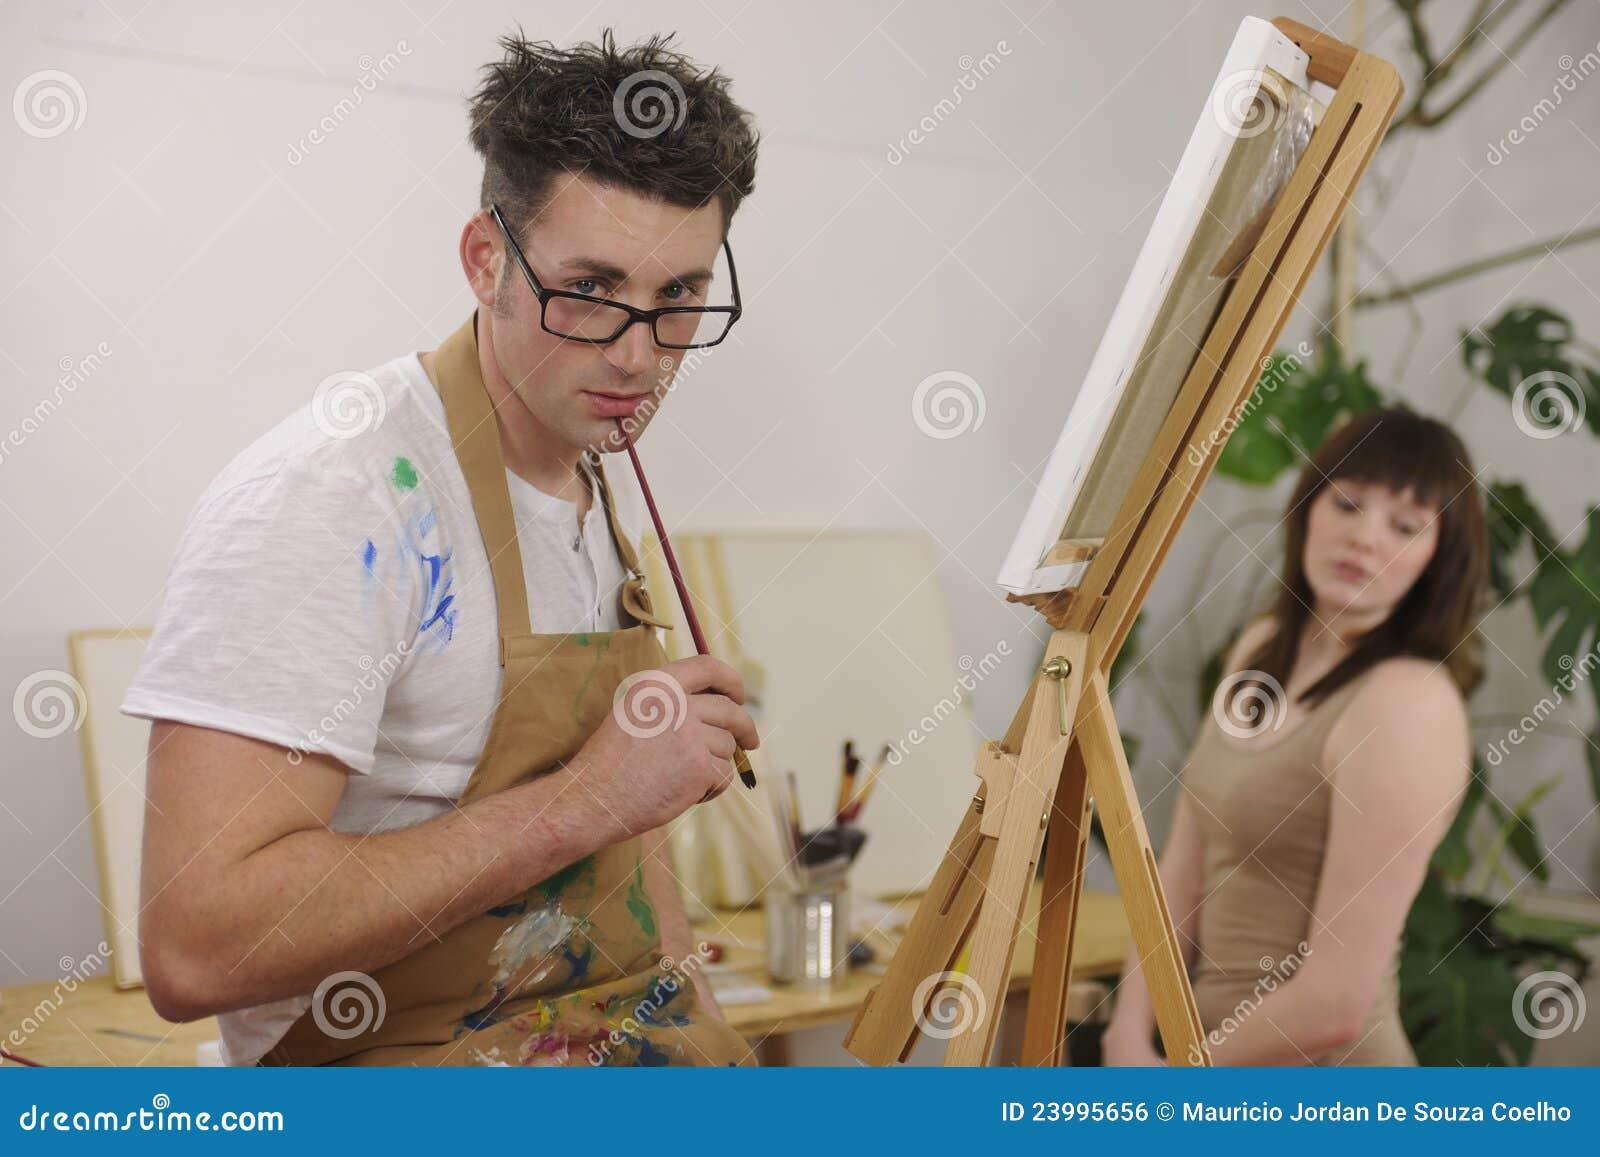 Dibujo y pintura cfnm - 1 10